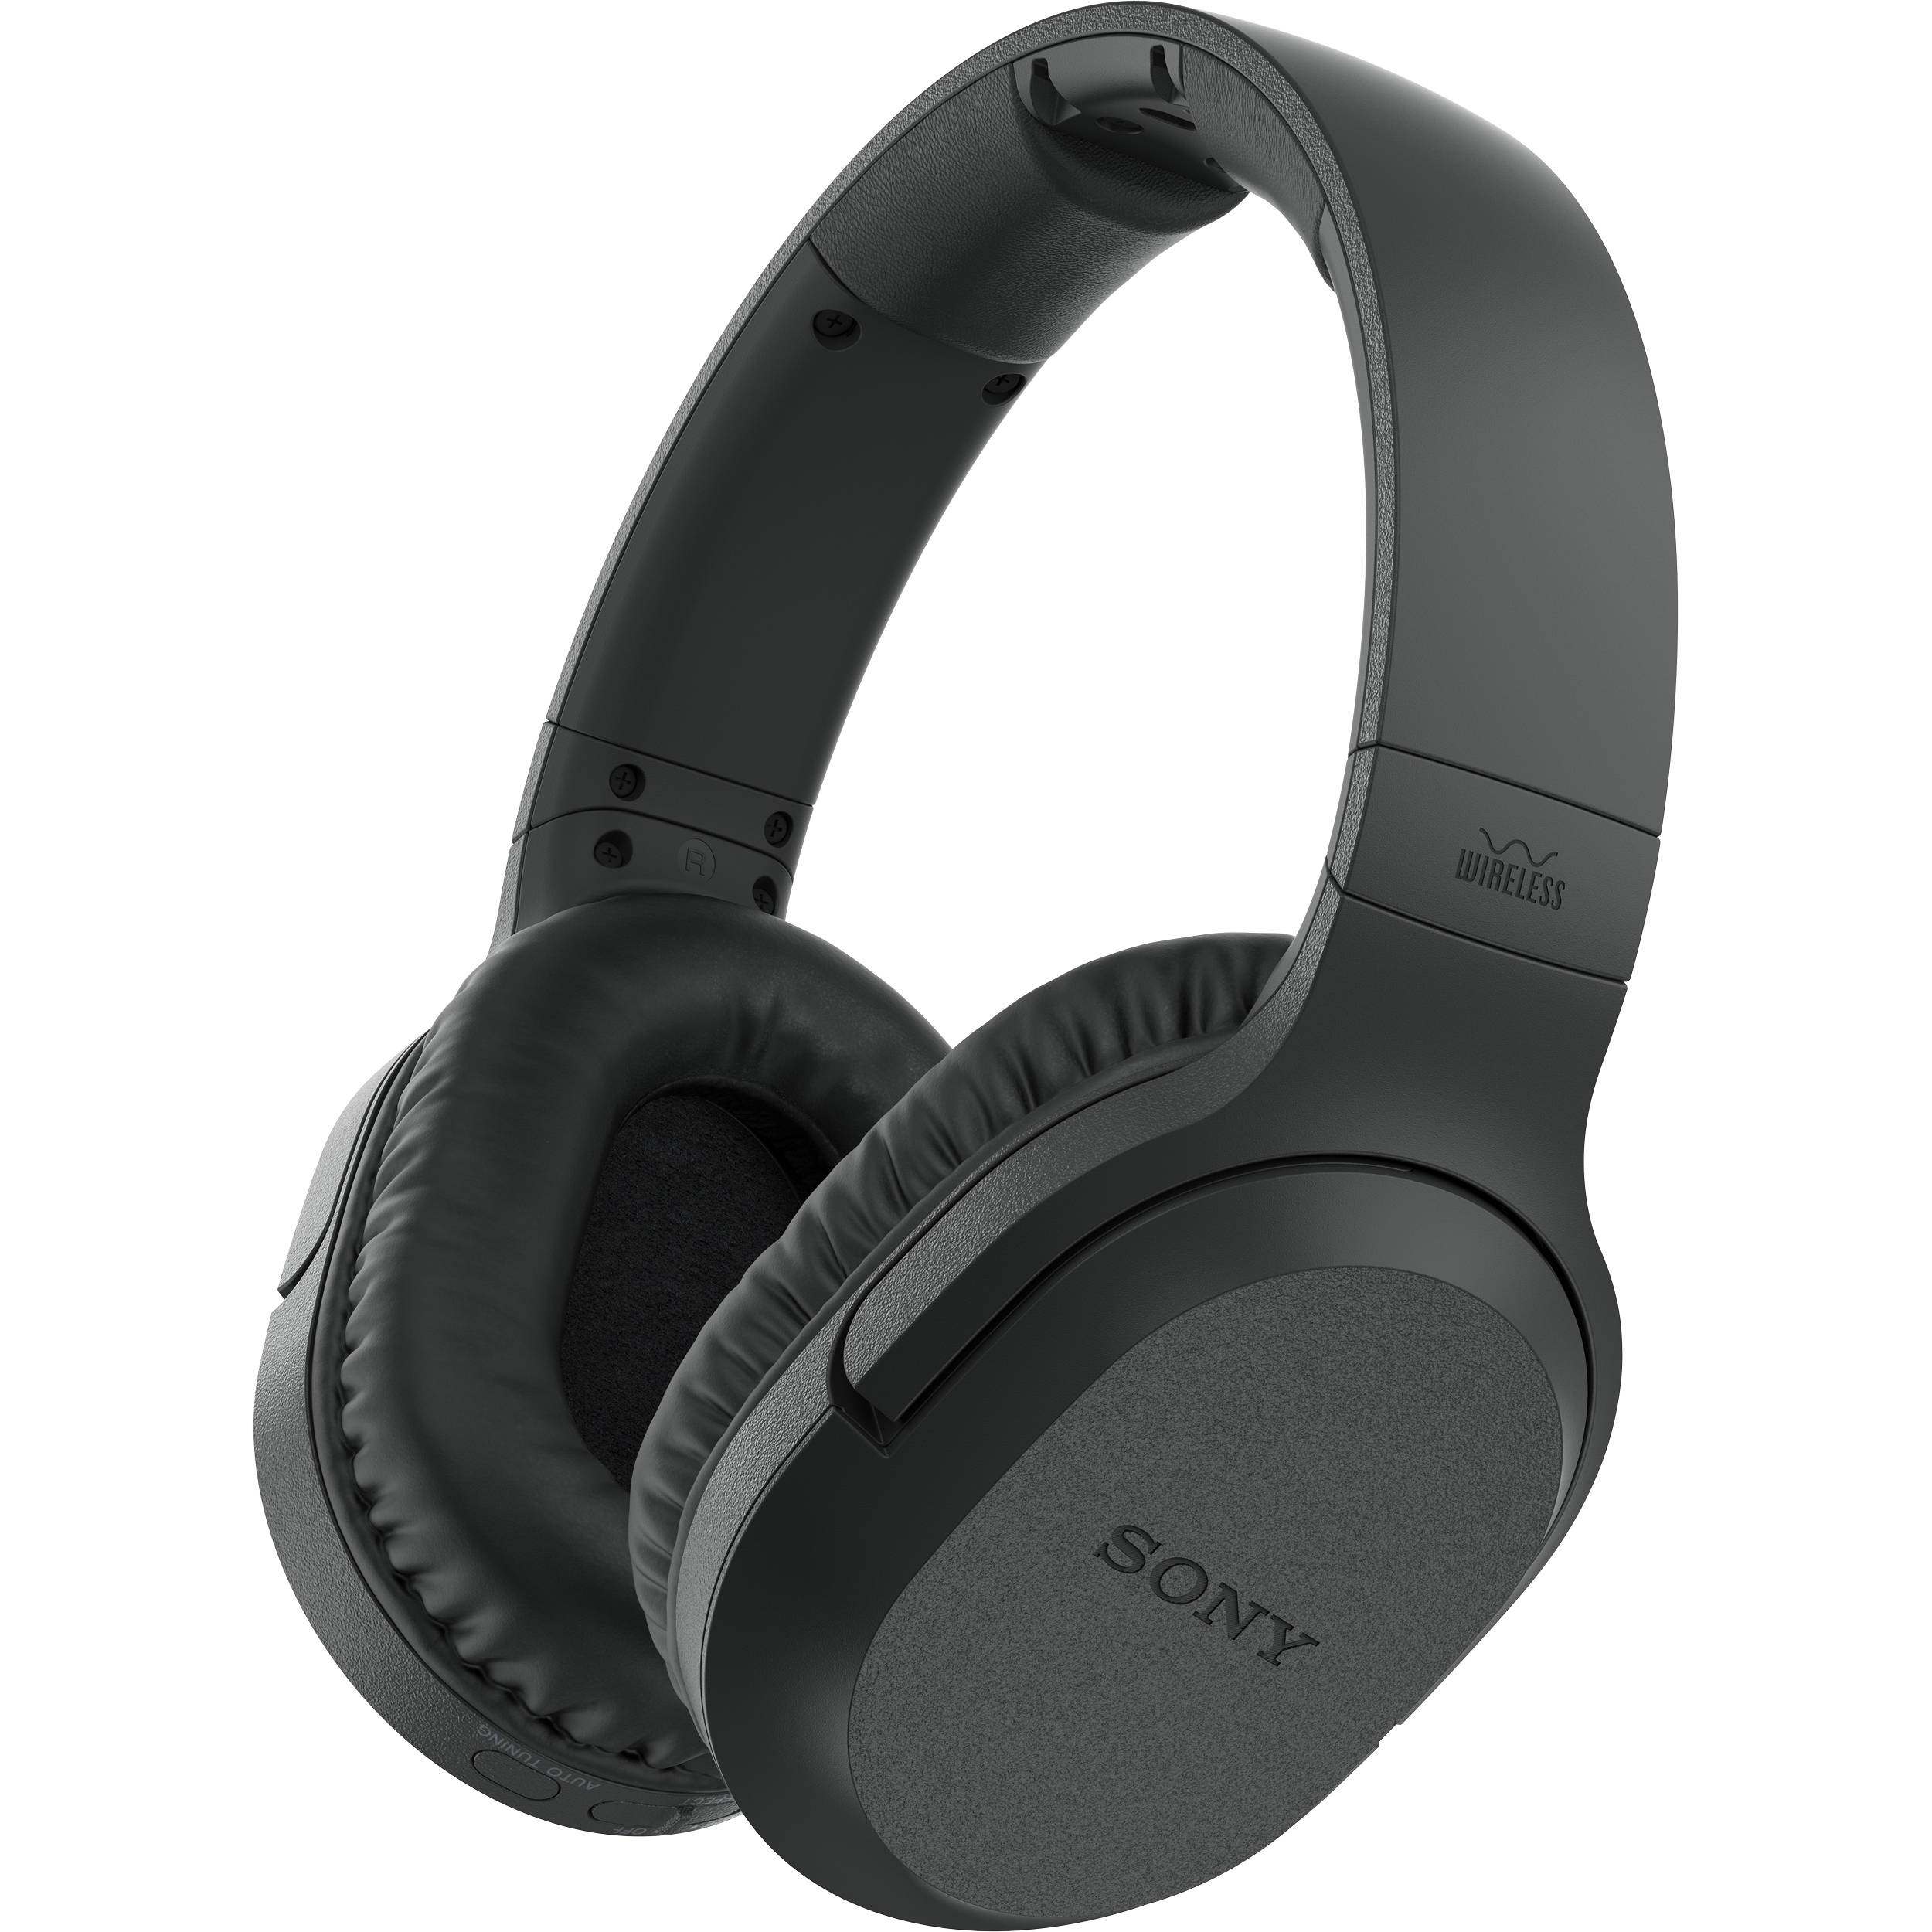 68b863e8958 Sony WH-RF400 Wireless Over-Ear Home Theater Headphones WHRF400